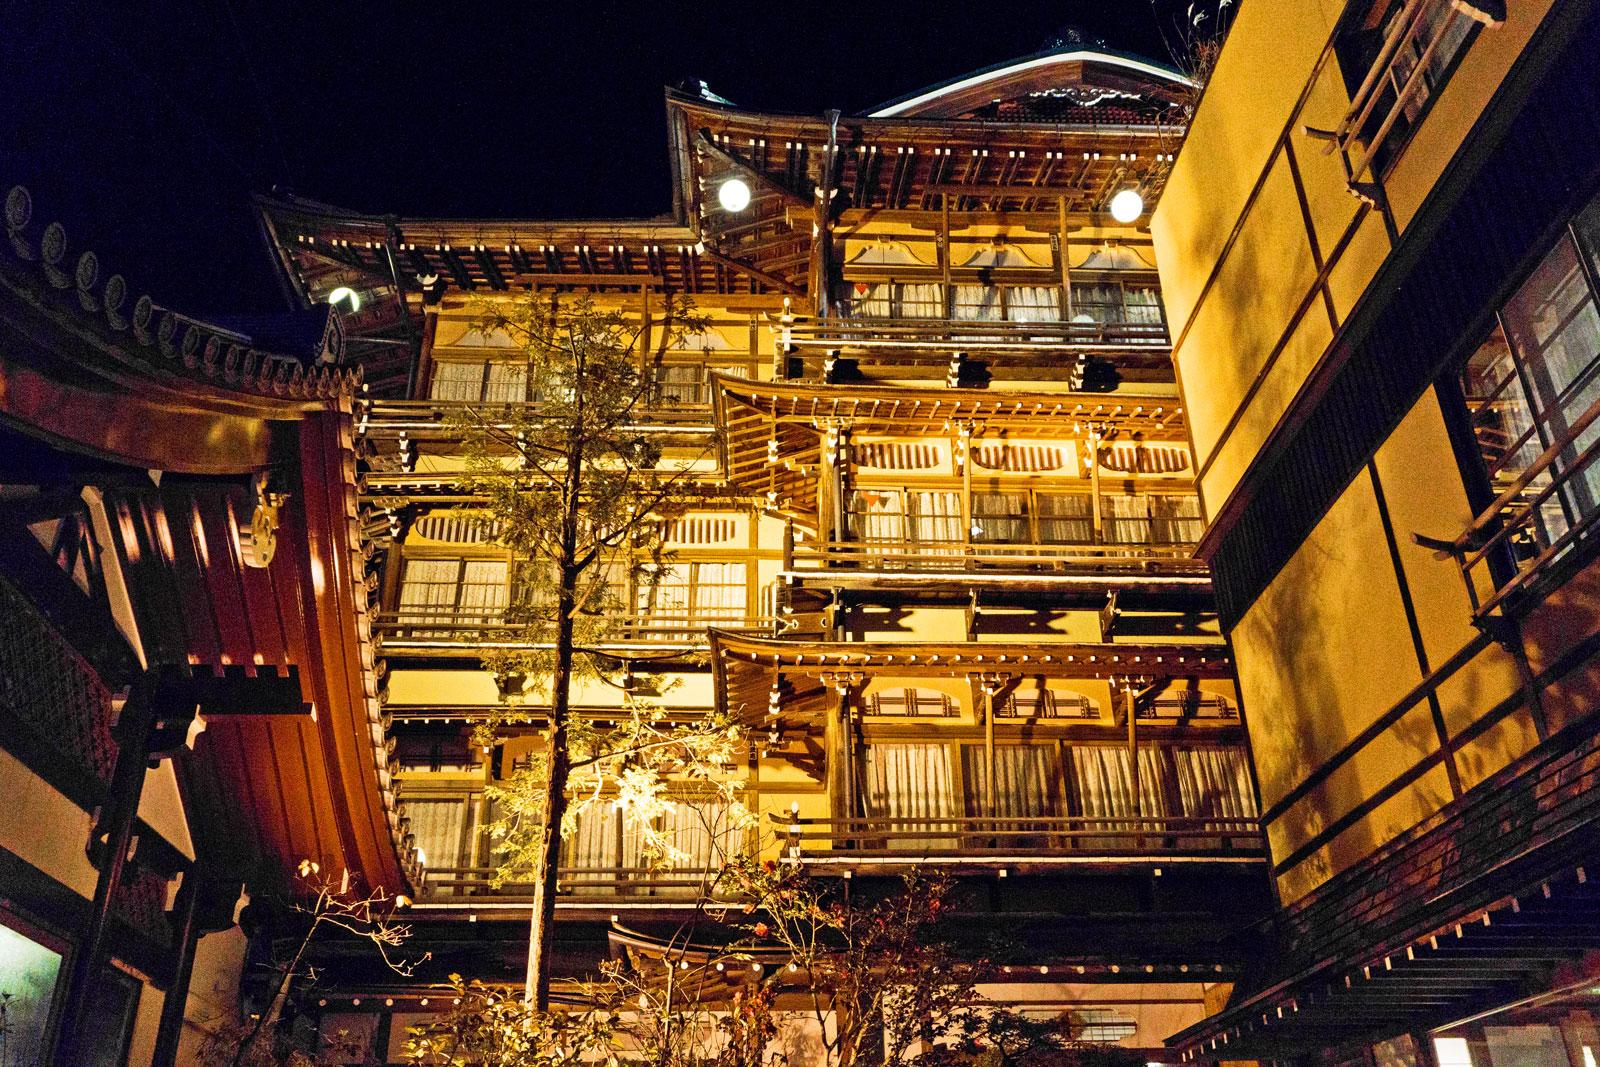 Shibu Onsen Nagano Japan